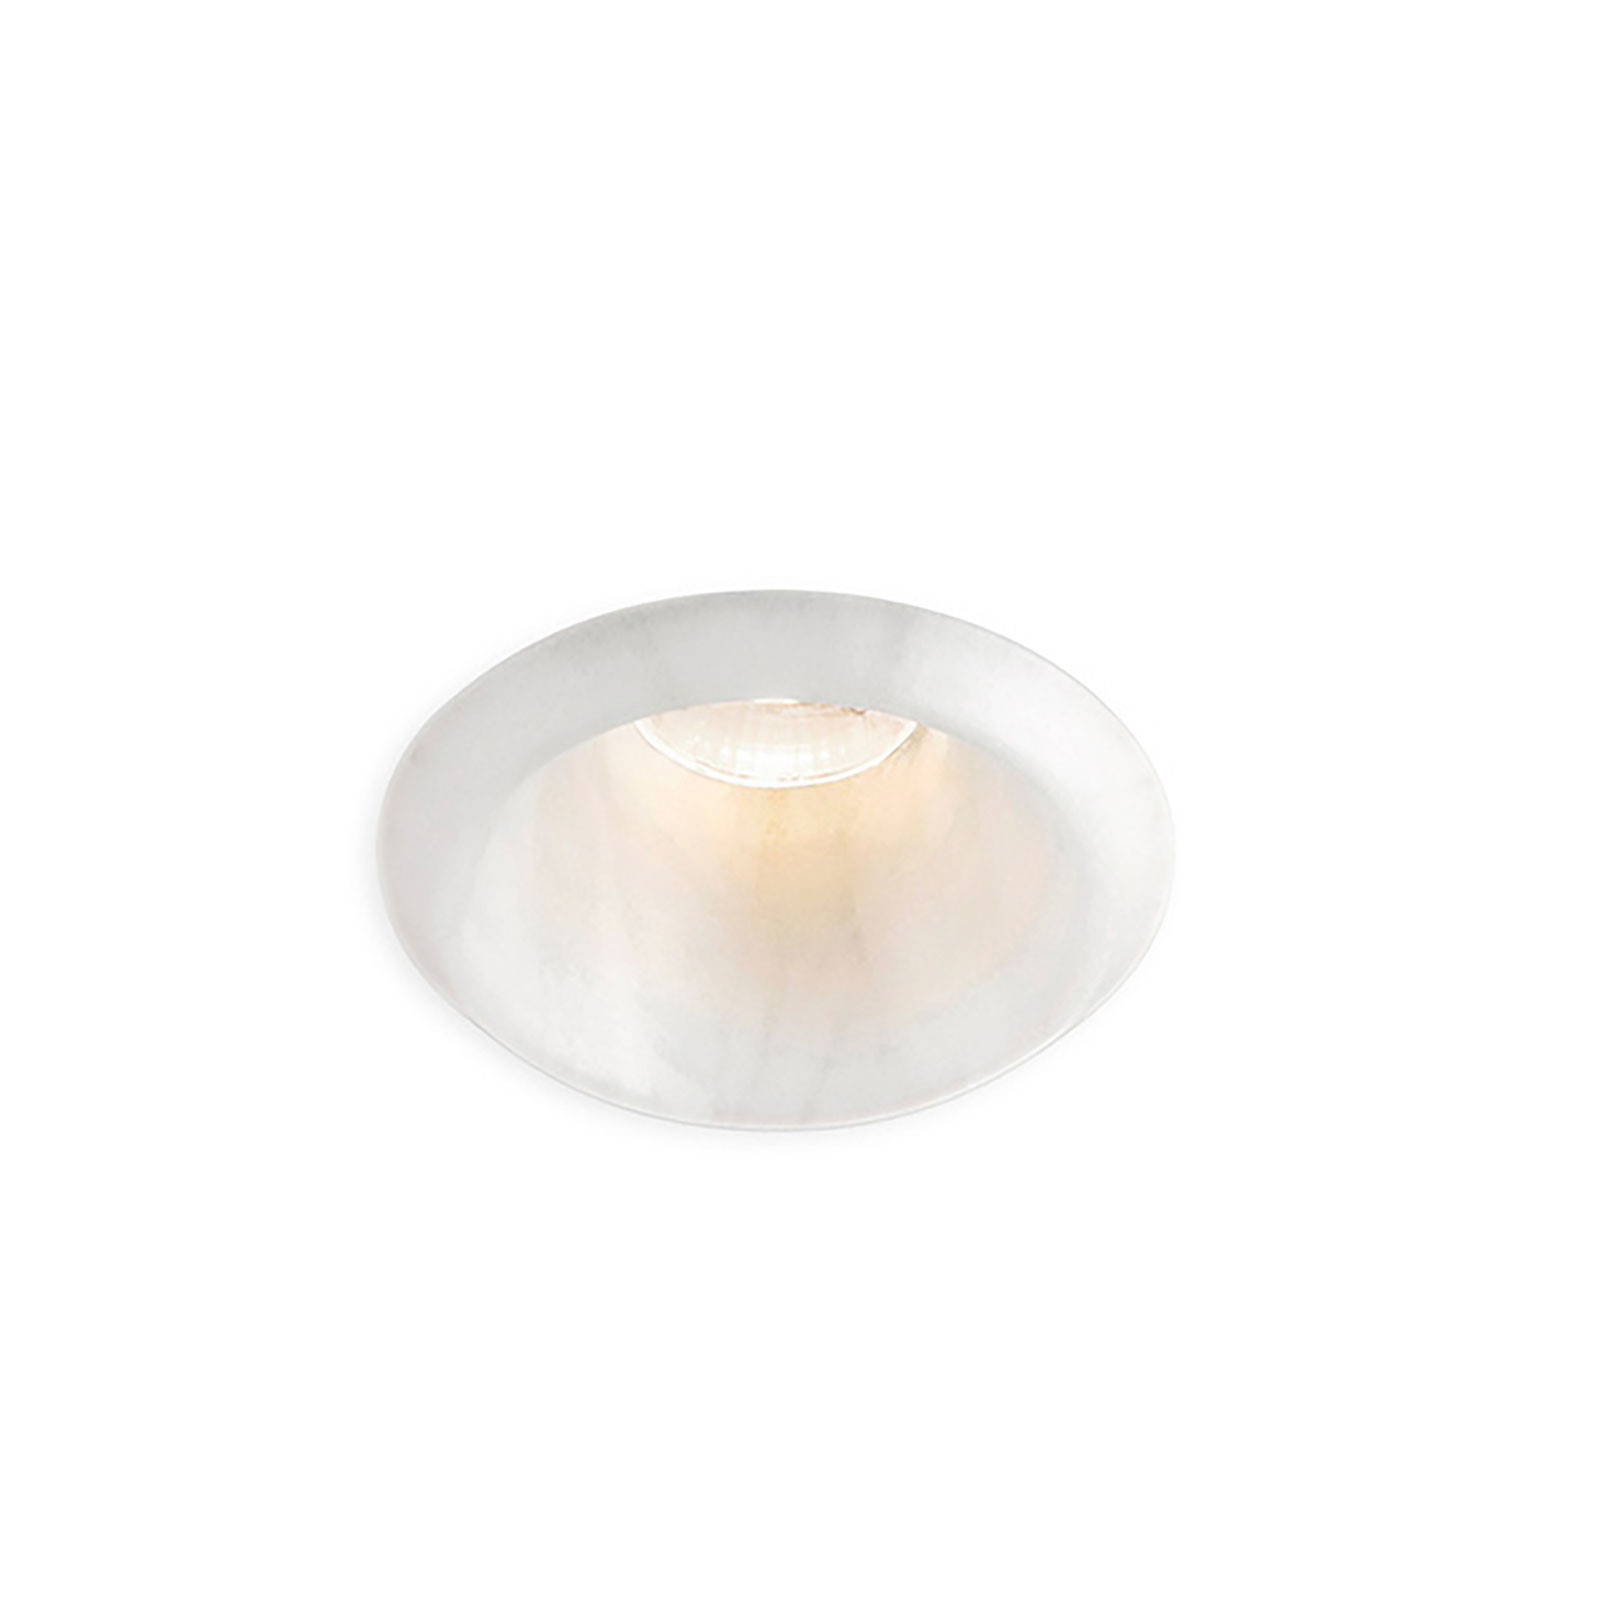 LEDS-C4 Play Raw Downlight Alabaster 927 6,4W 50°